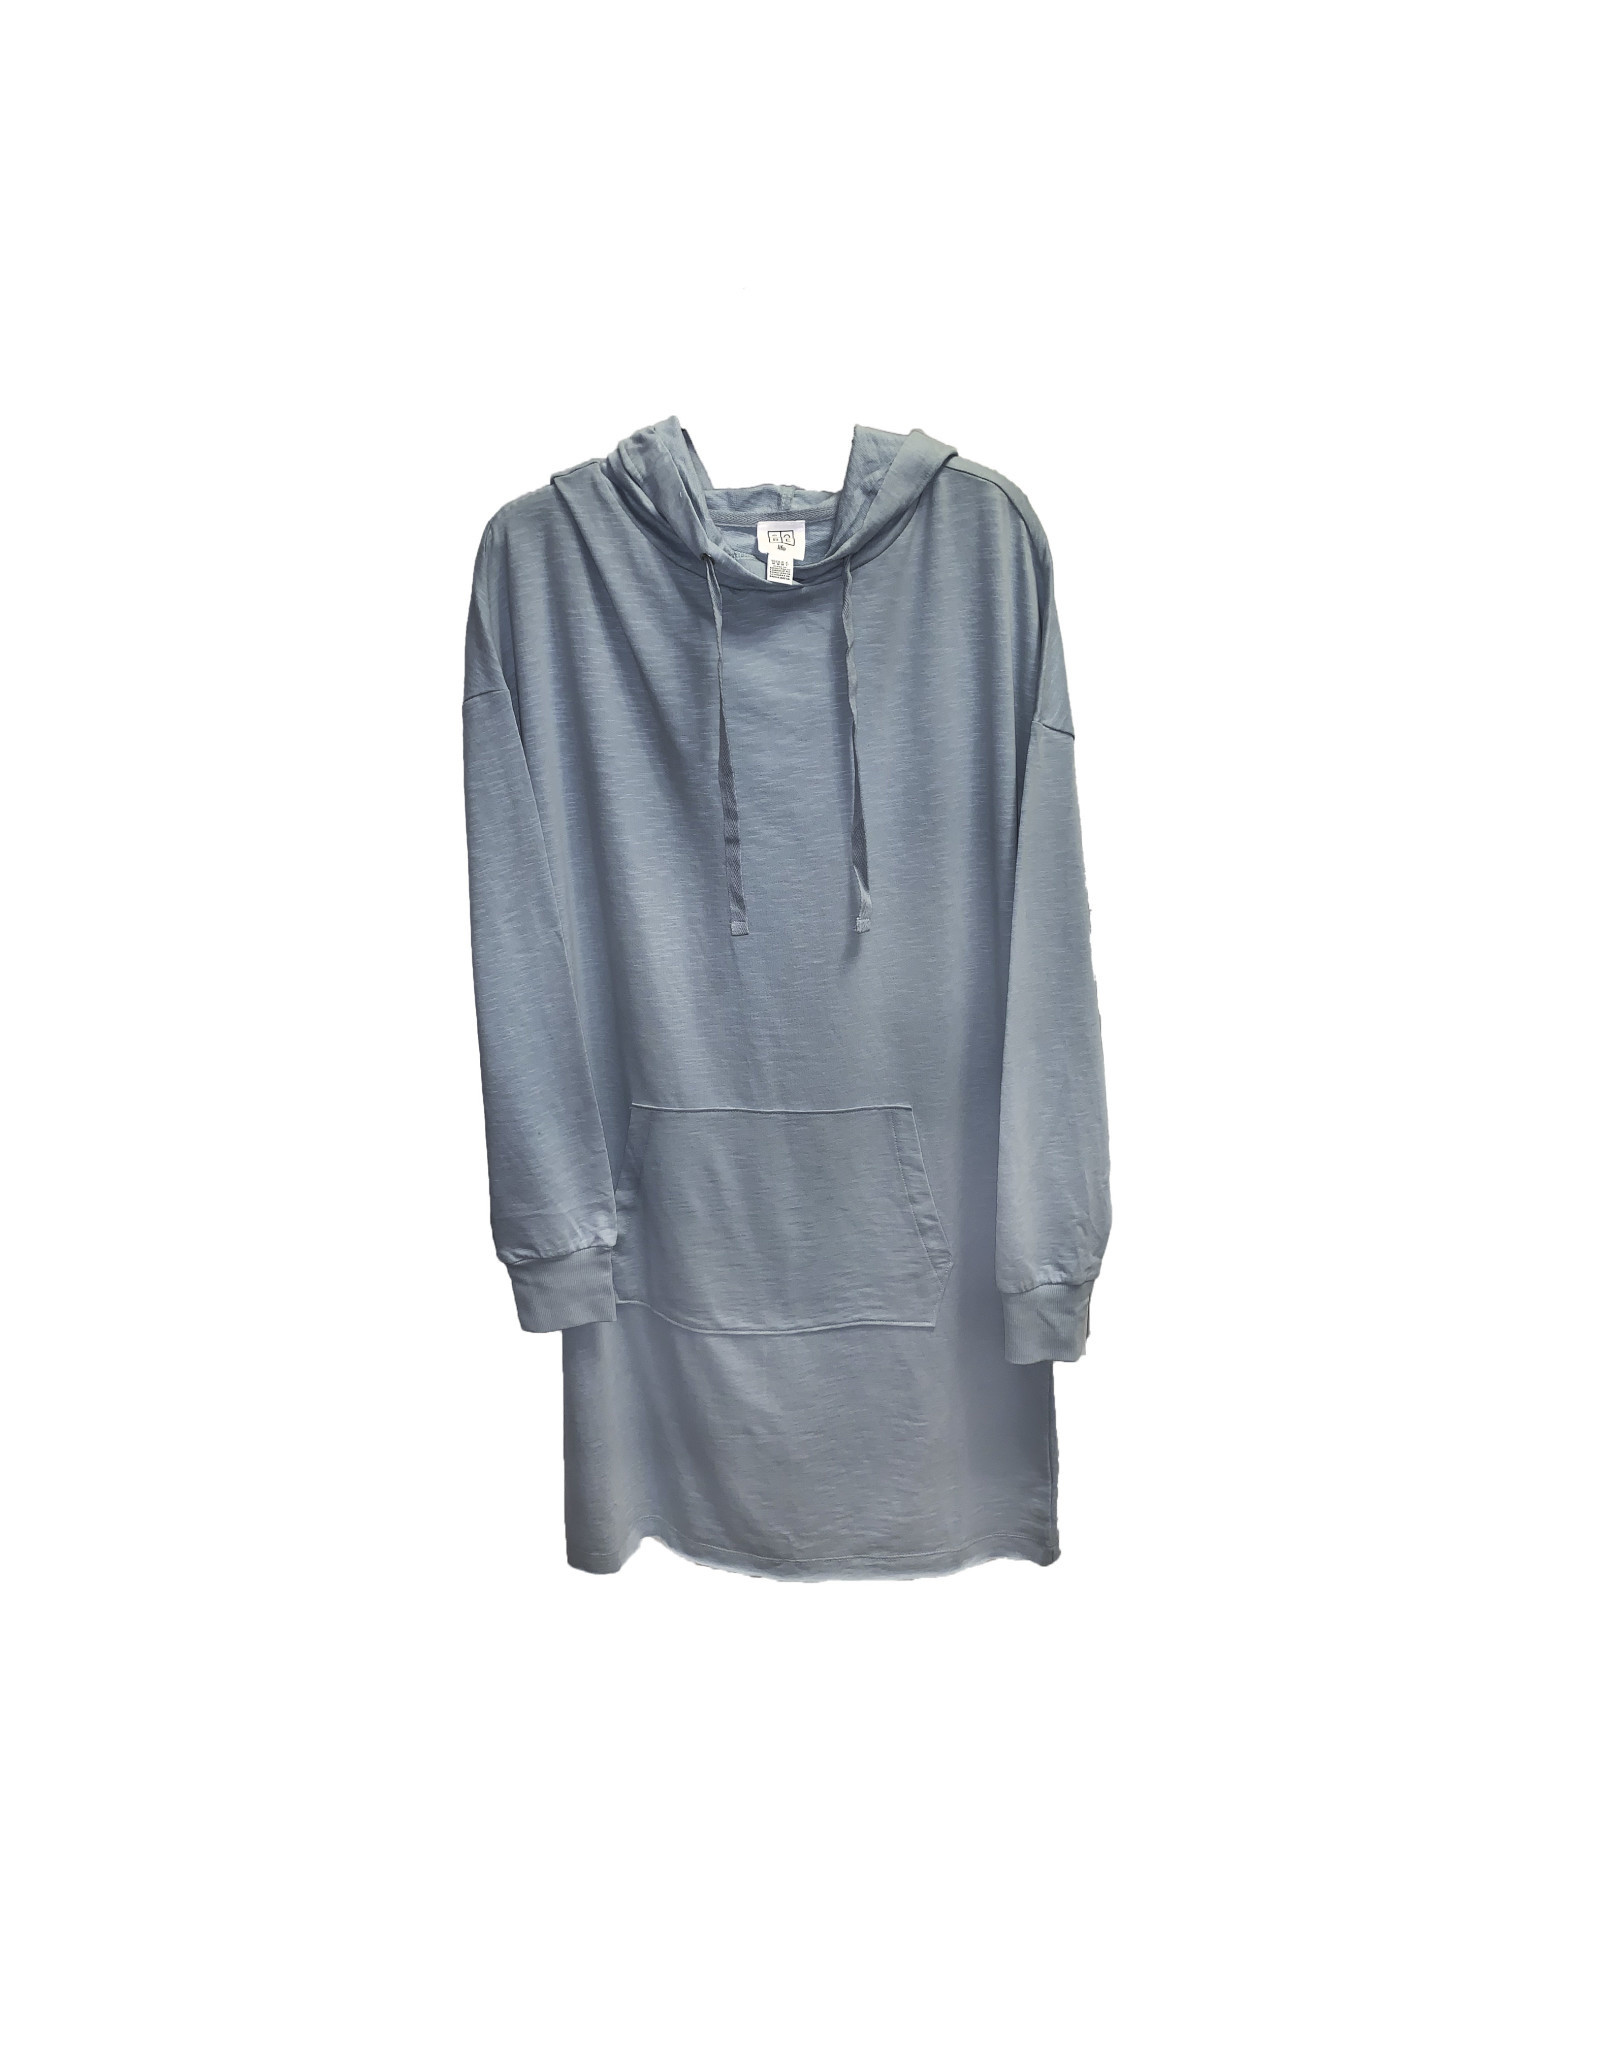 Core Life Core Life Sweatshirt Hoodie Dress